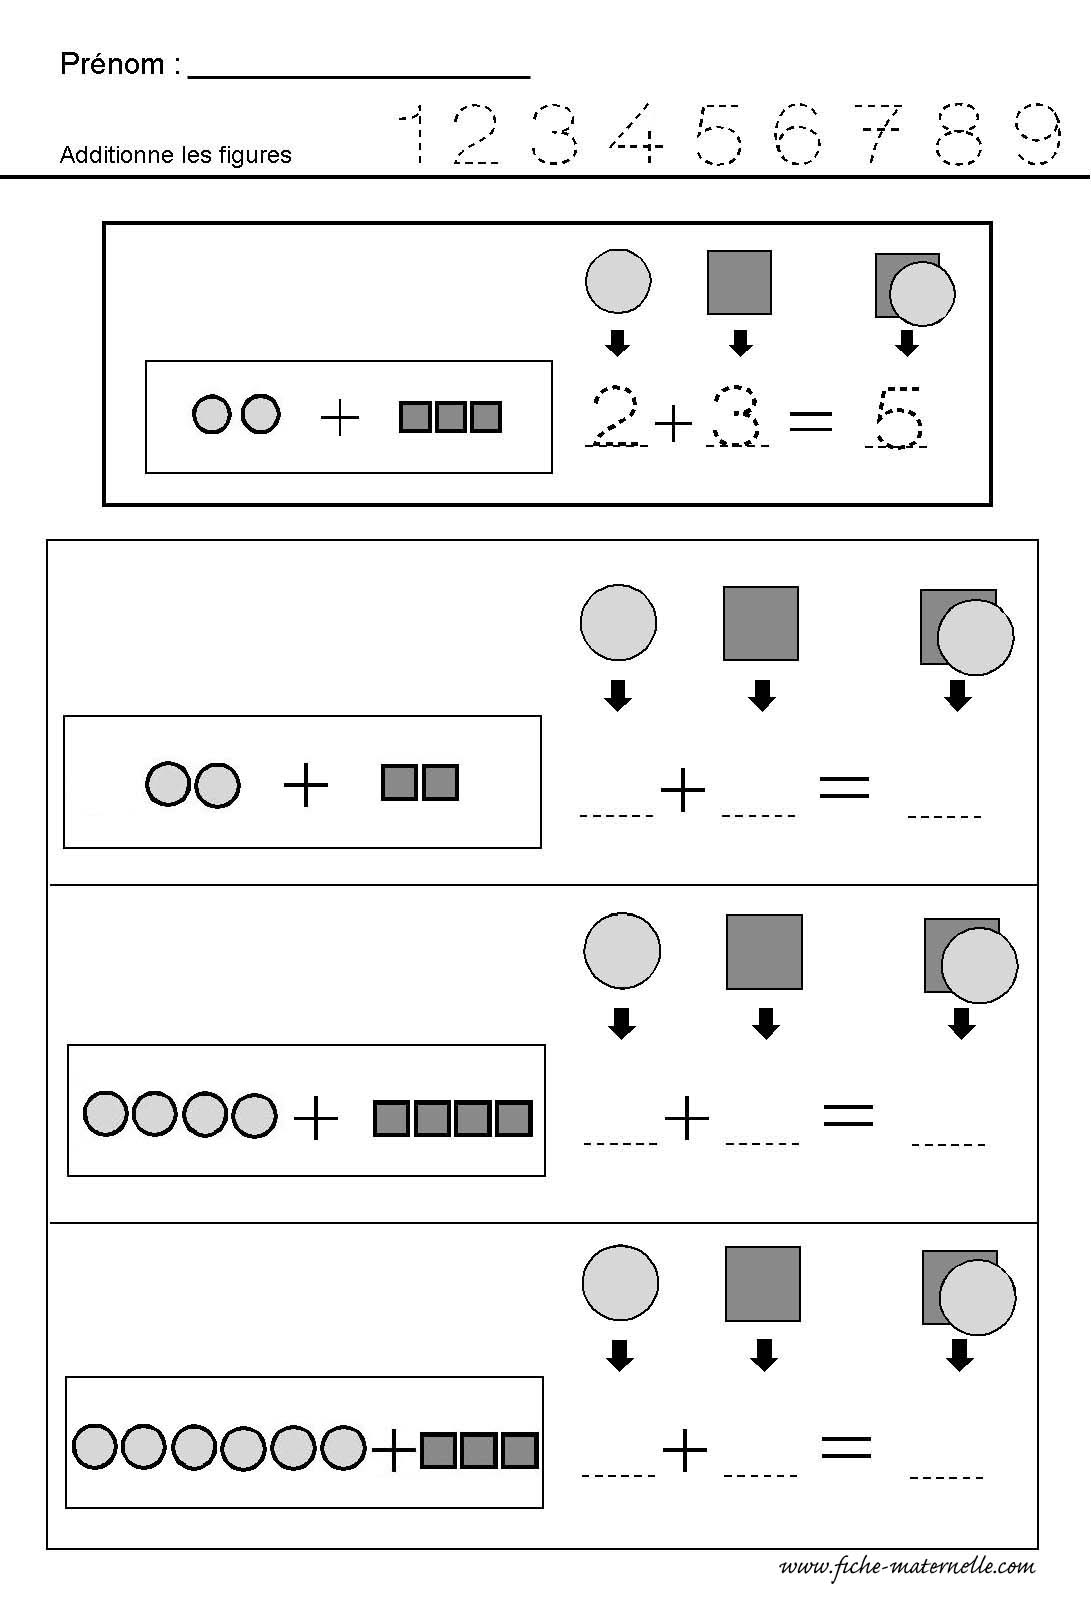 Des Formes Worksheet Collection | Printable Worksheets And dedans Exercice Maternelle Moyenne Section